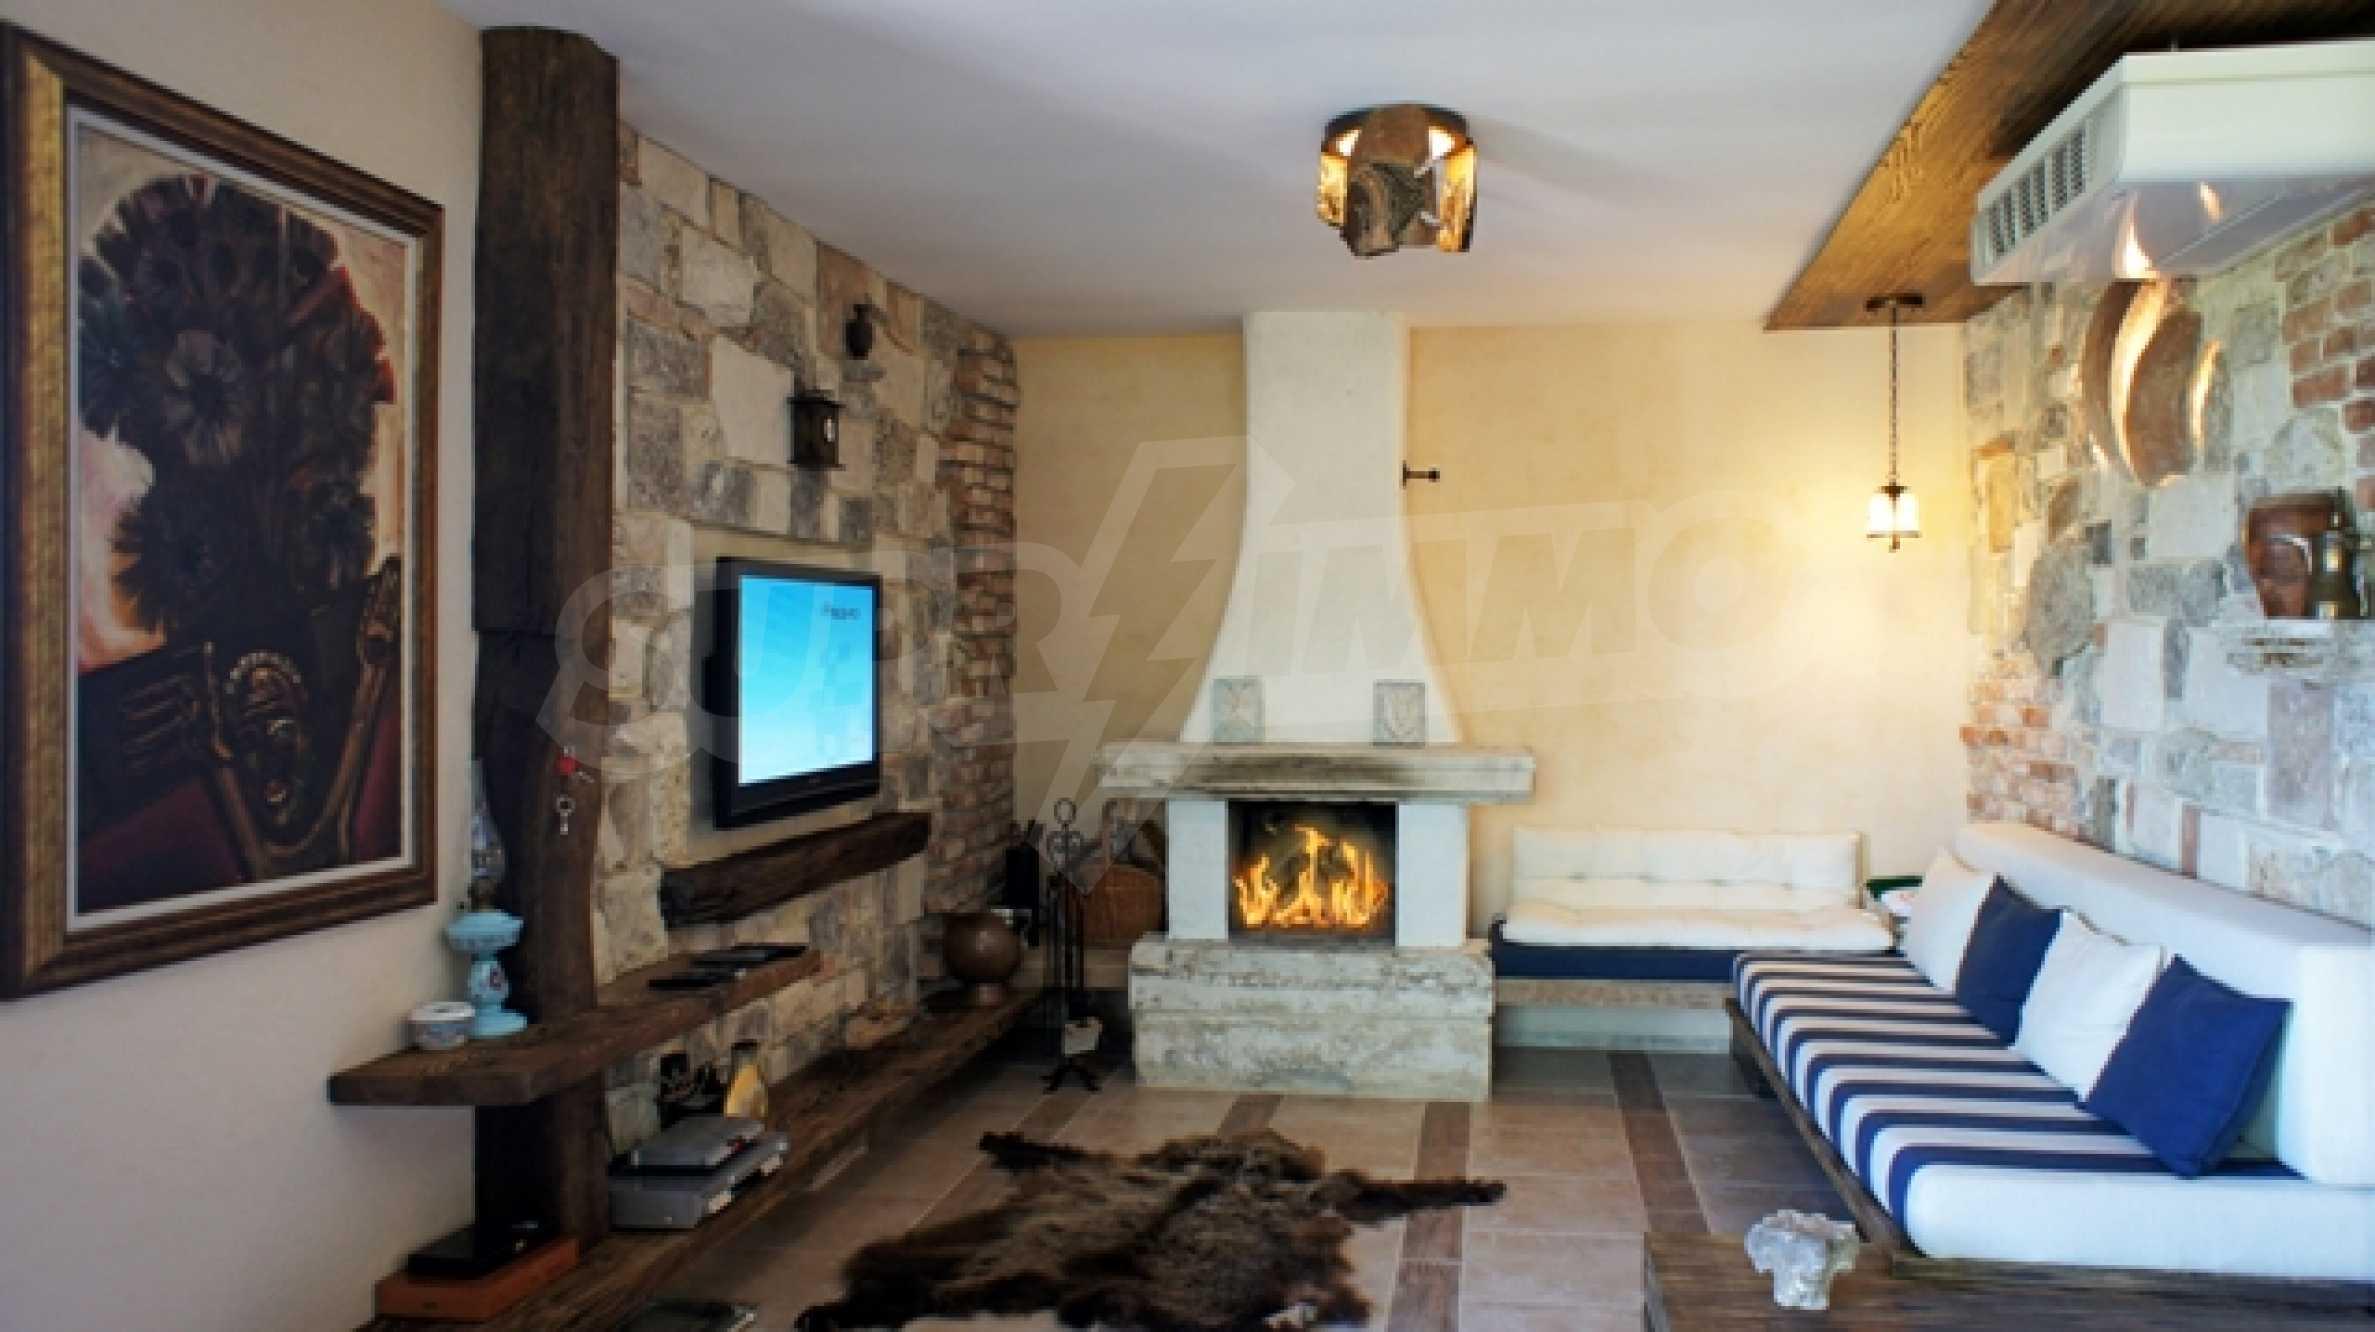 The Mediterranean style - a sense of luxury 31